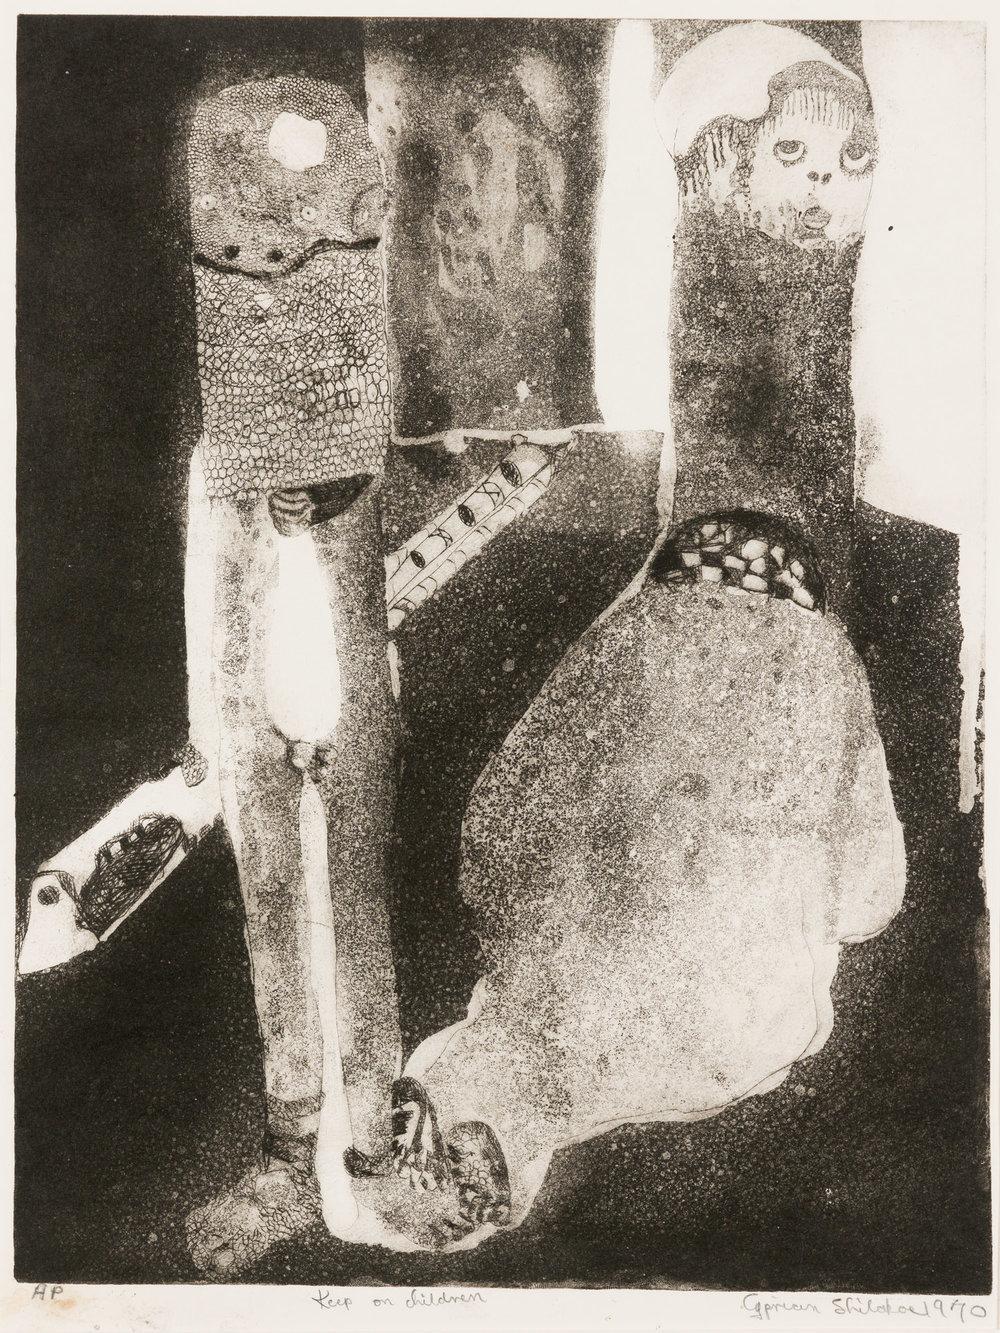 Cyprian Shilakoe